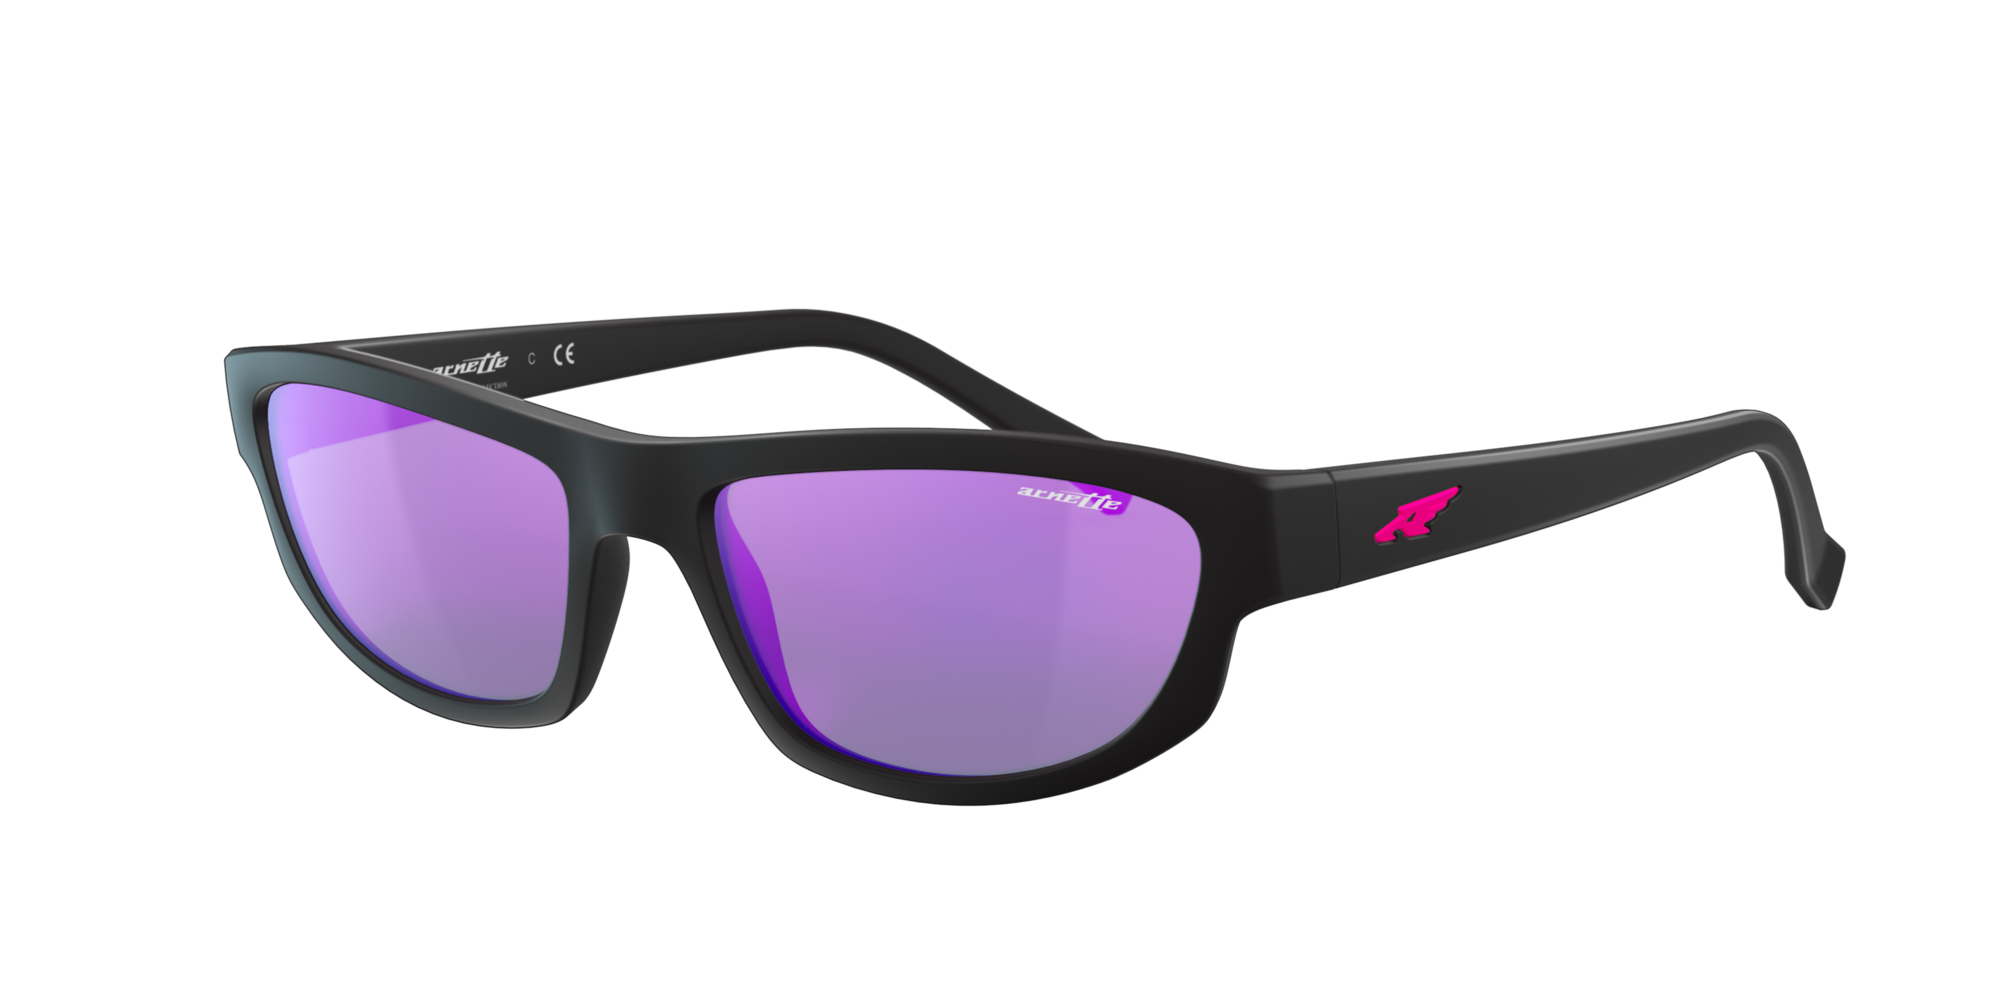 Arnette Unisex  AN4260 -  Frame color: Negro, Lens color: Violeta, Size FA-LS/145